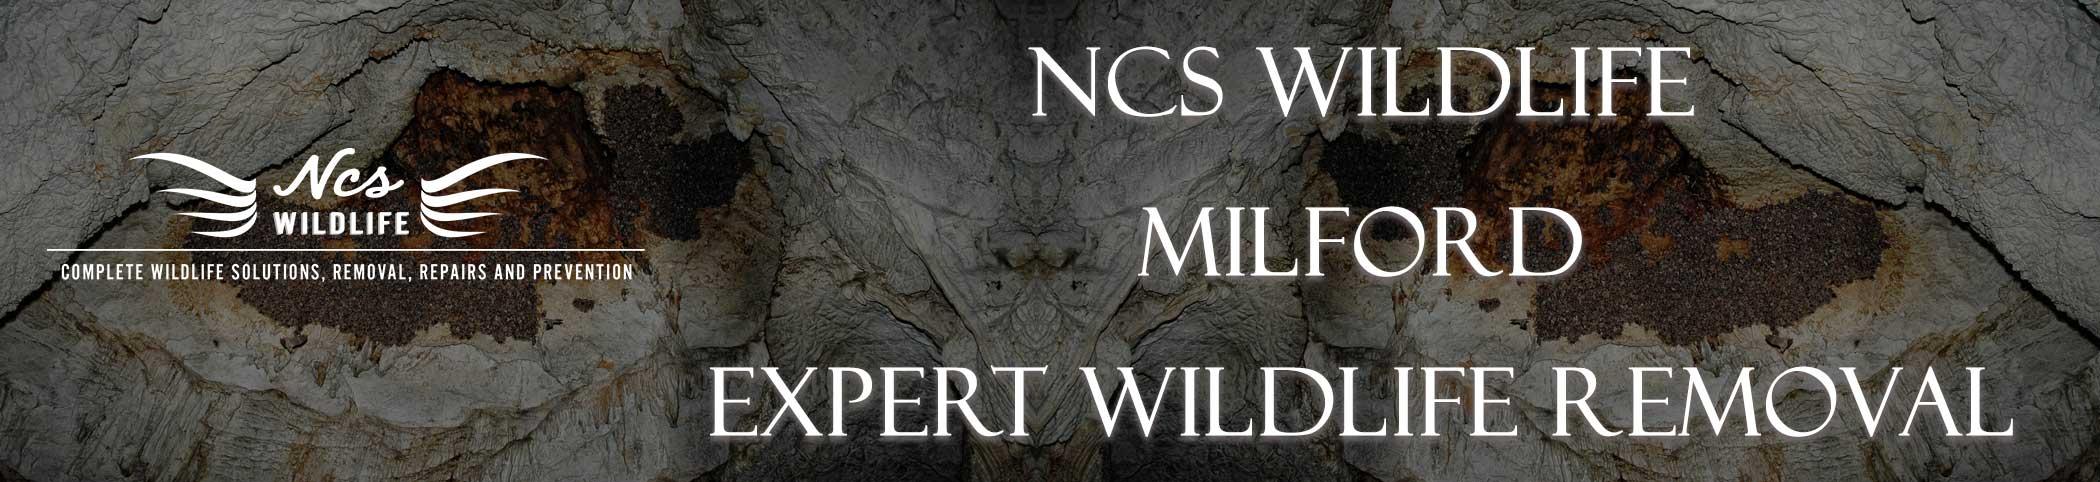 ncs-wildlife-milford